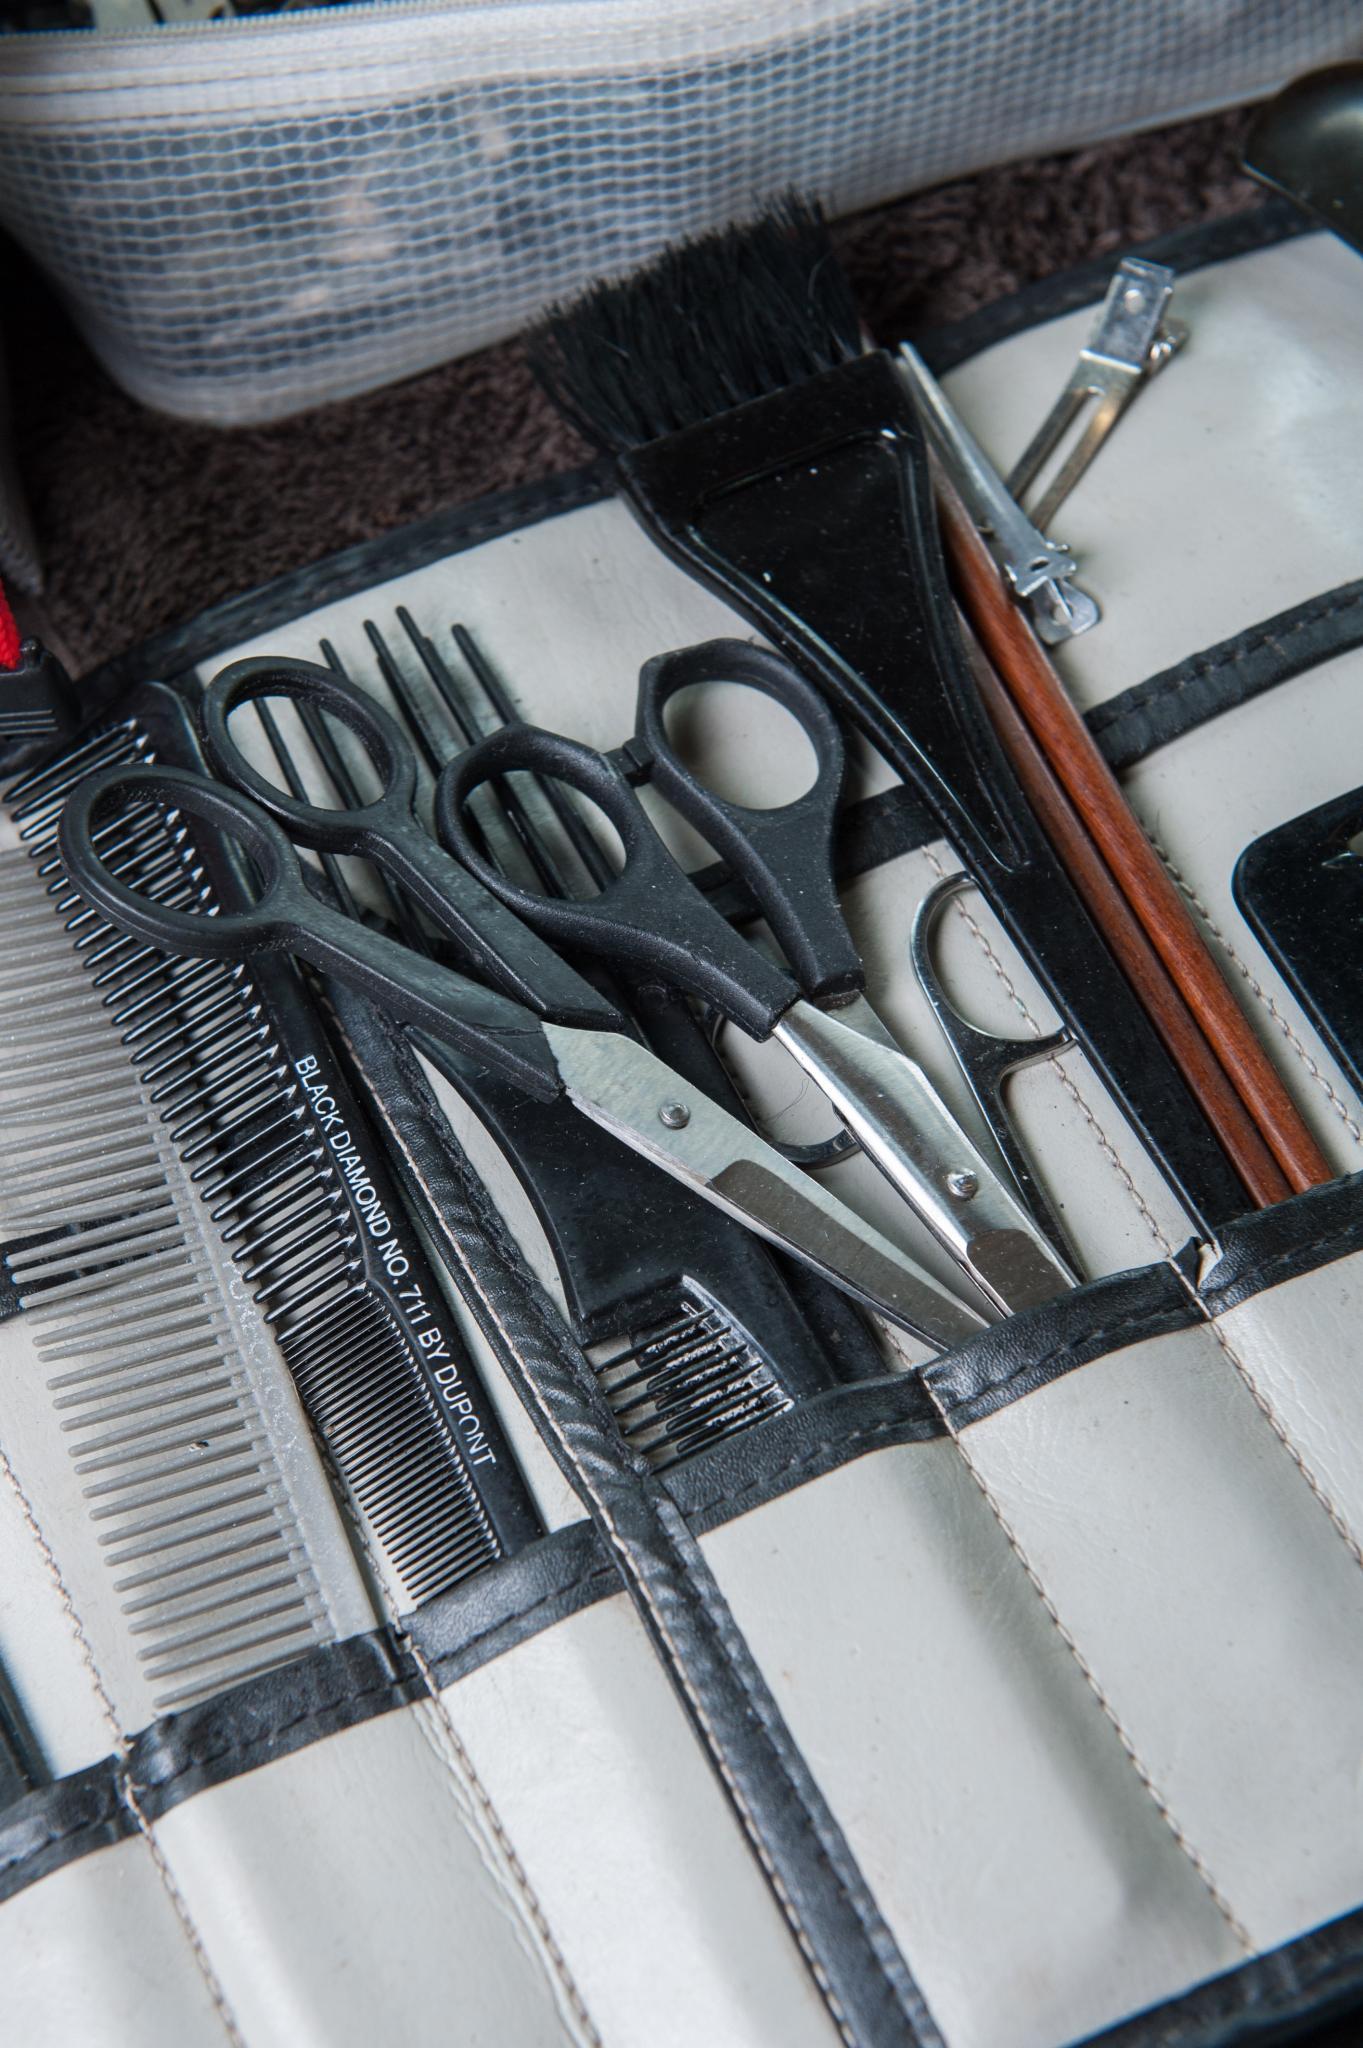 Kit de peluquero (sobre con tijeras, peines, etc.)